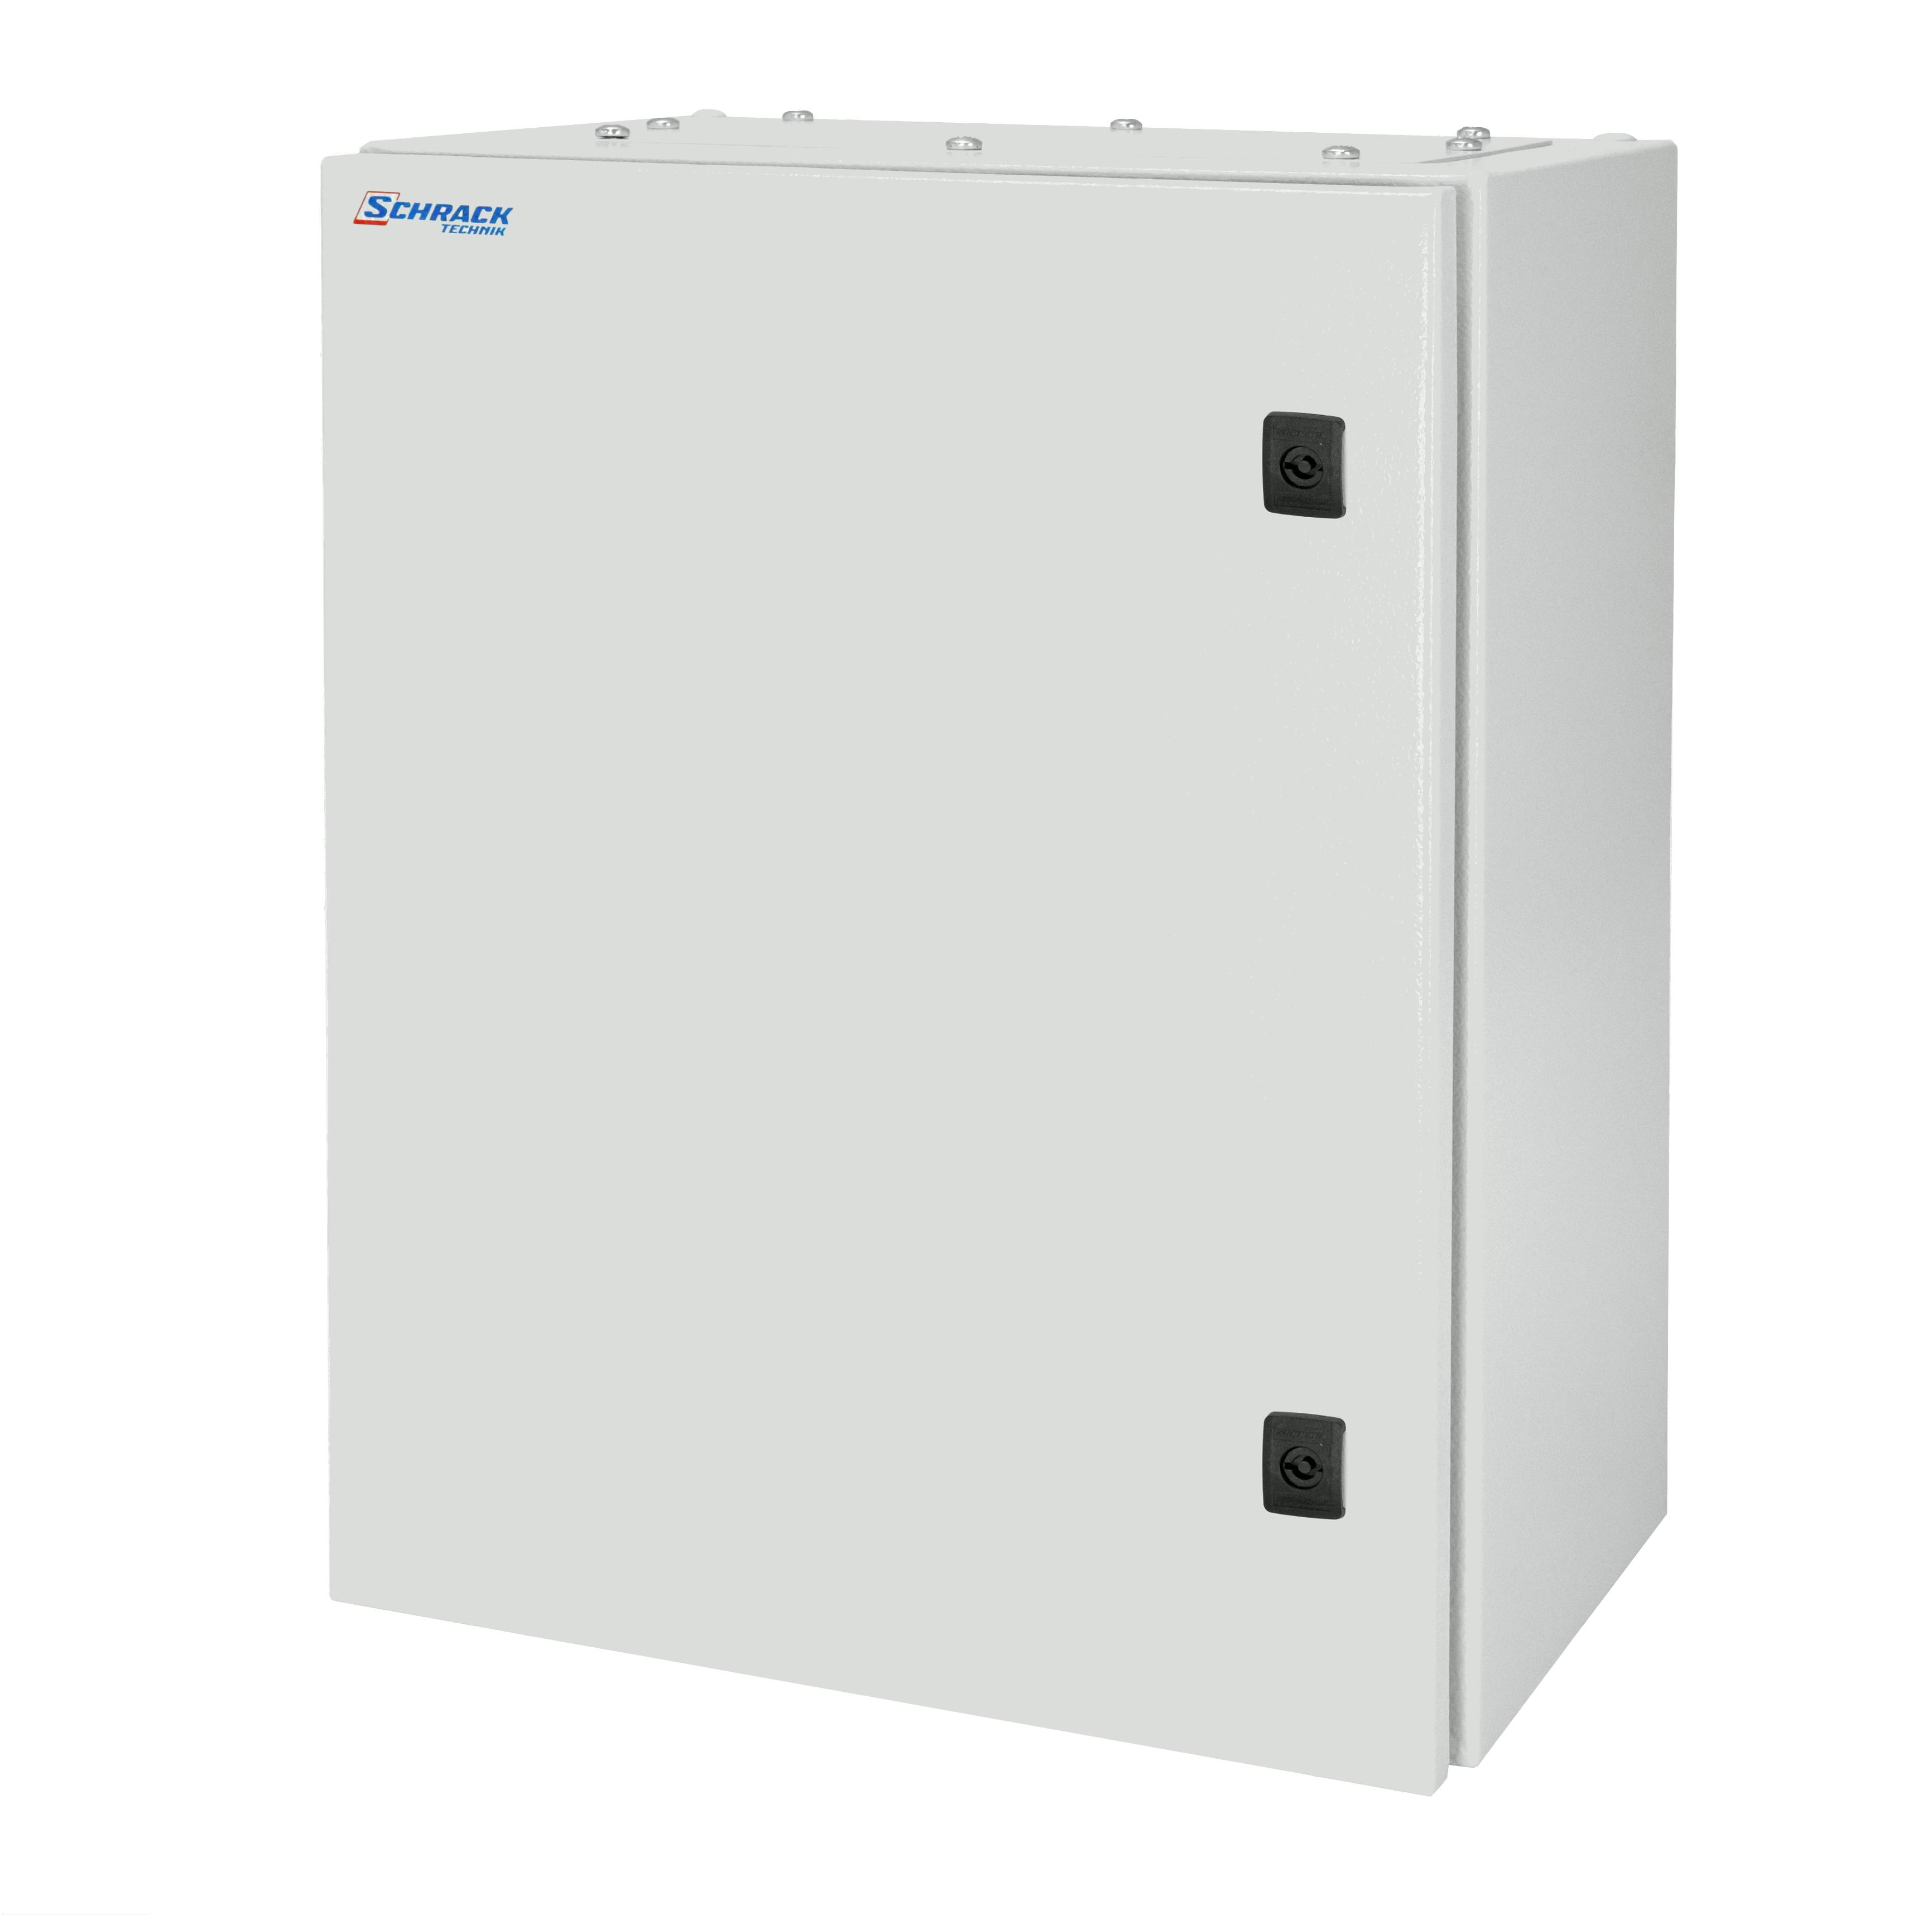 1 Stk Wandschrank Mono IP66 H=600 B=600 T=210 Stahlblech WSM6060210